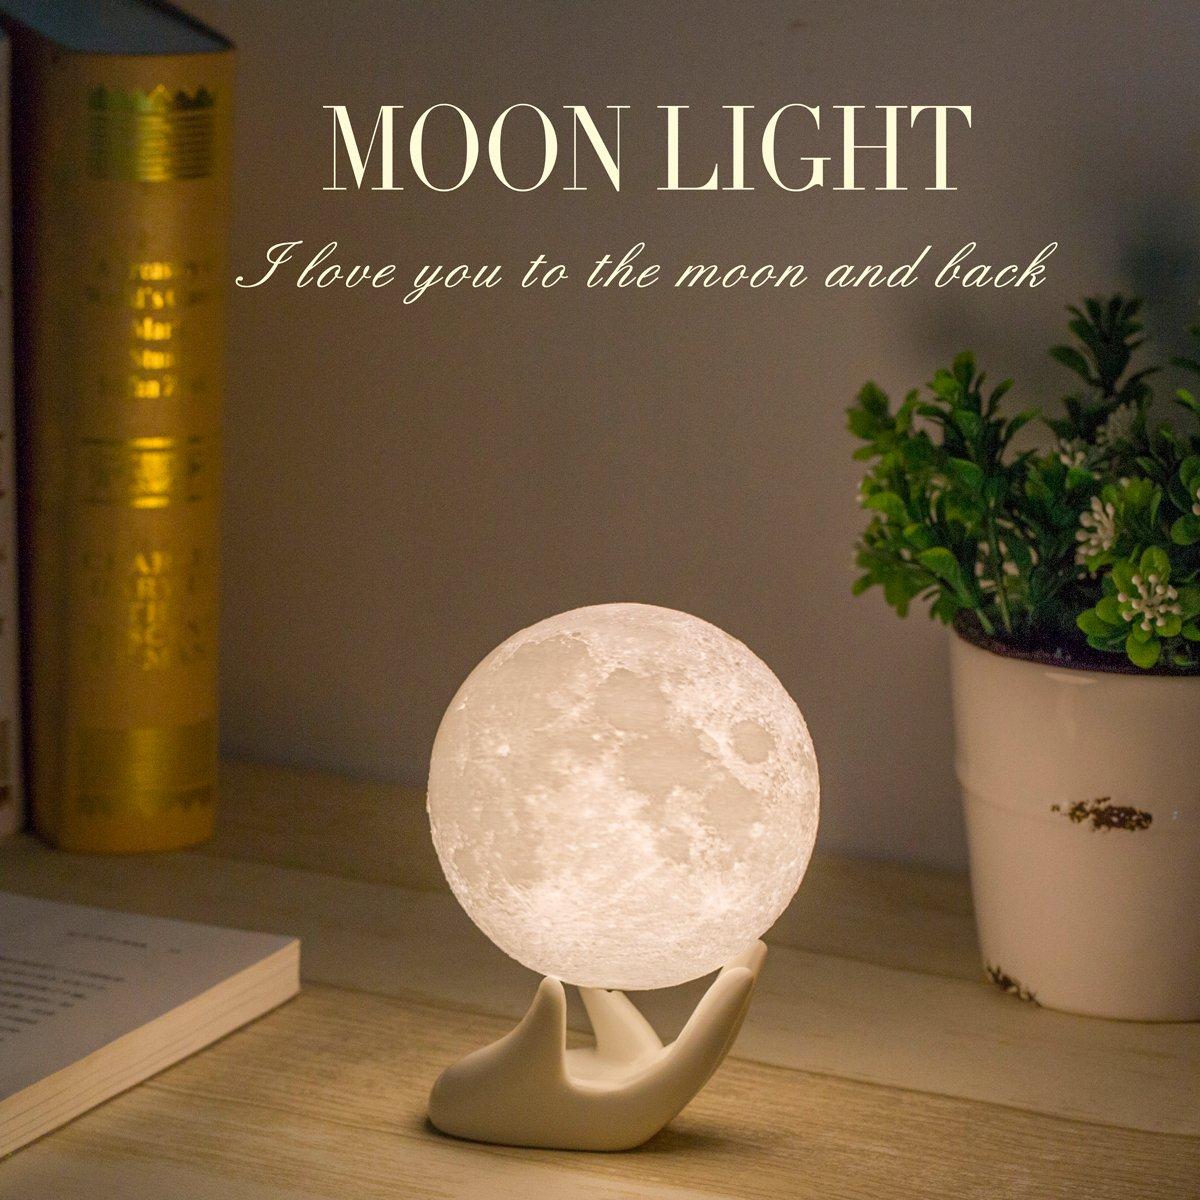 Moon Light Lamp 0644436754702/